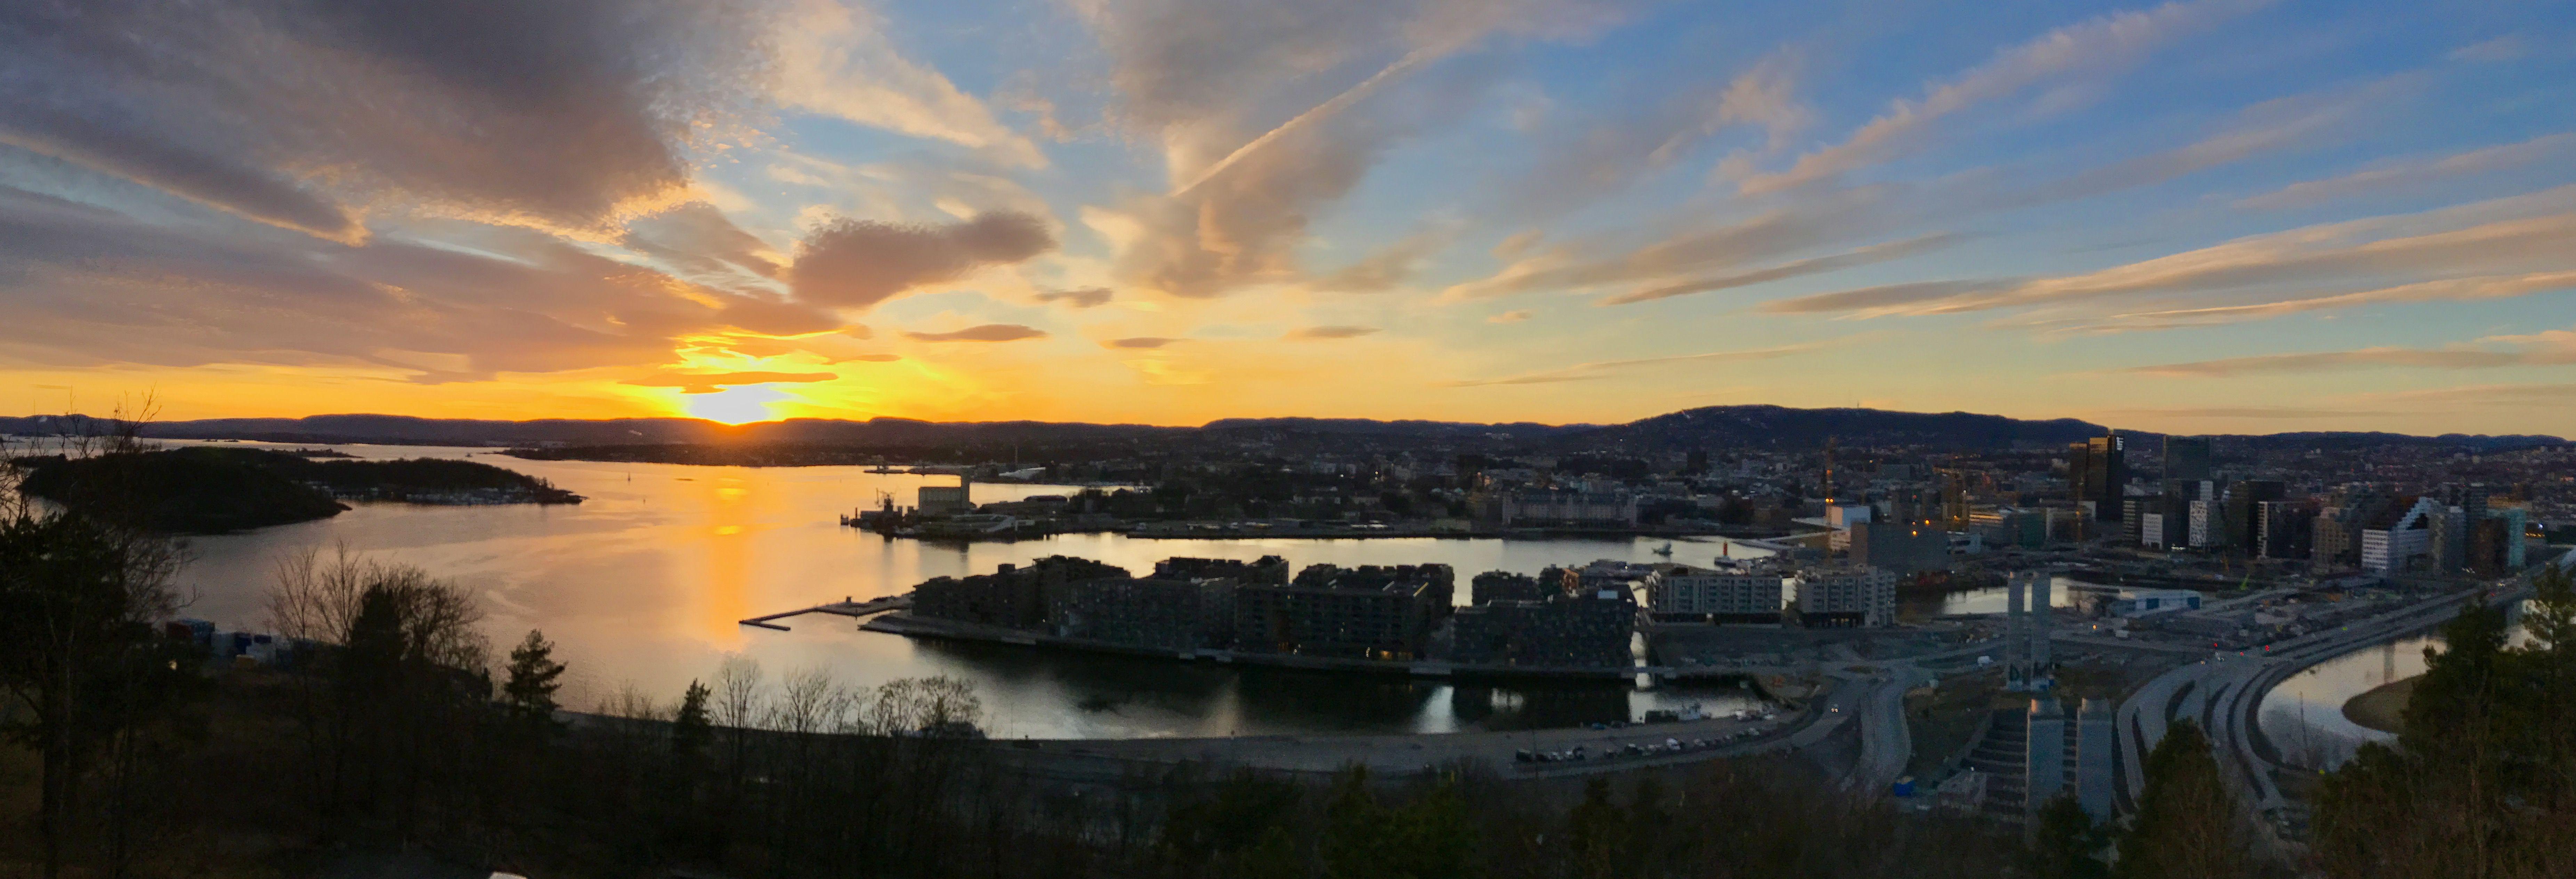 Oslo, Ekeberg